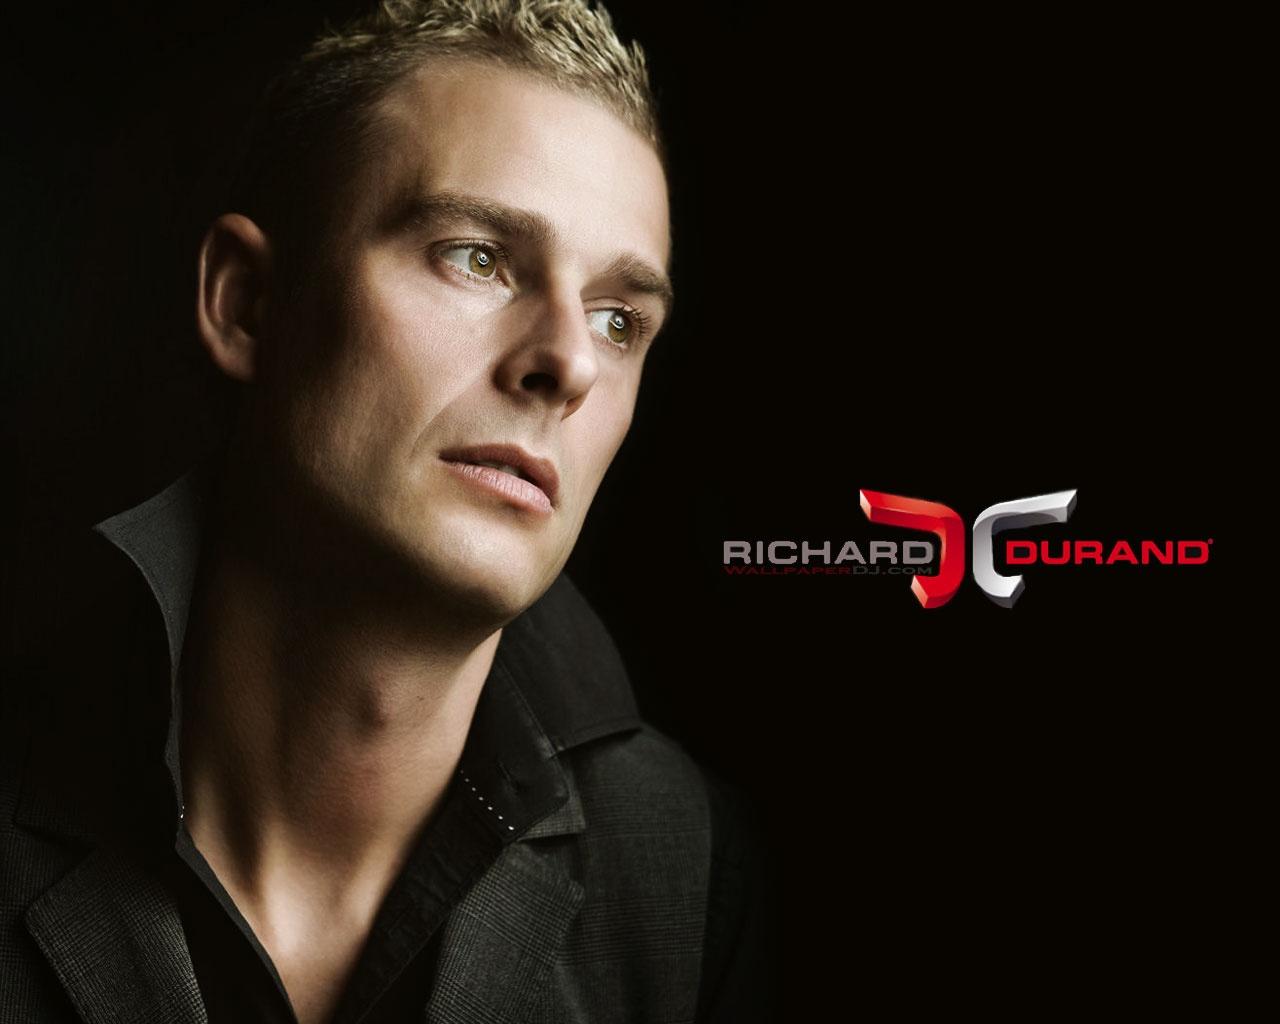 Richard Durand - Trancematic